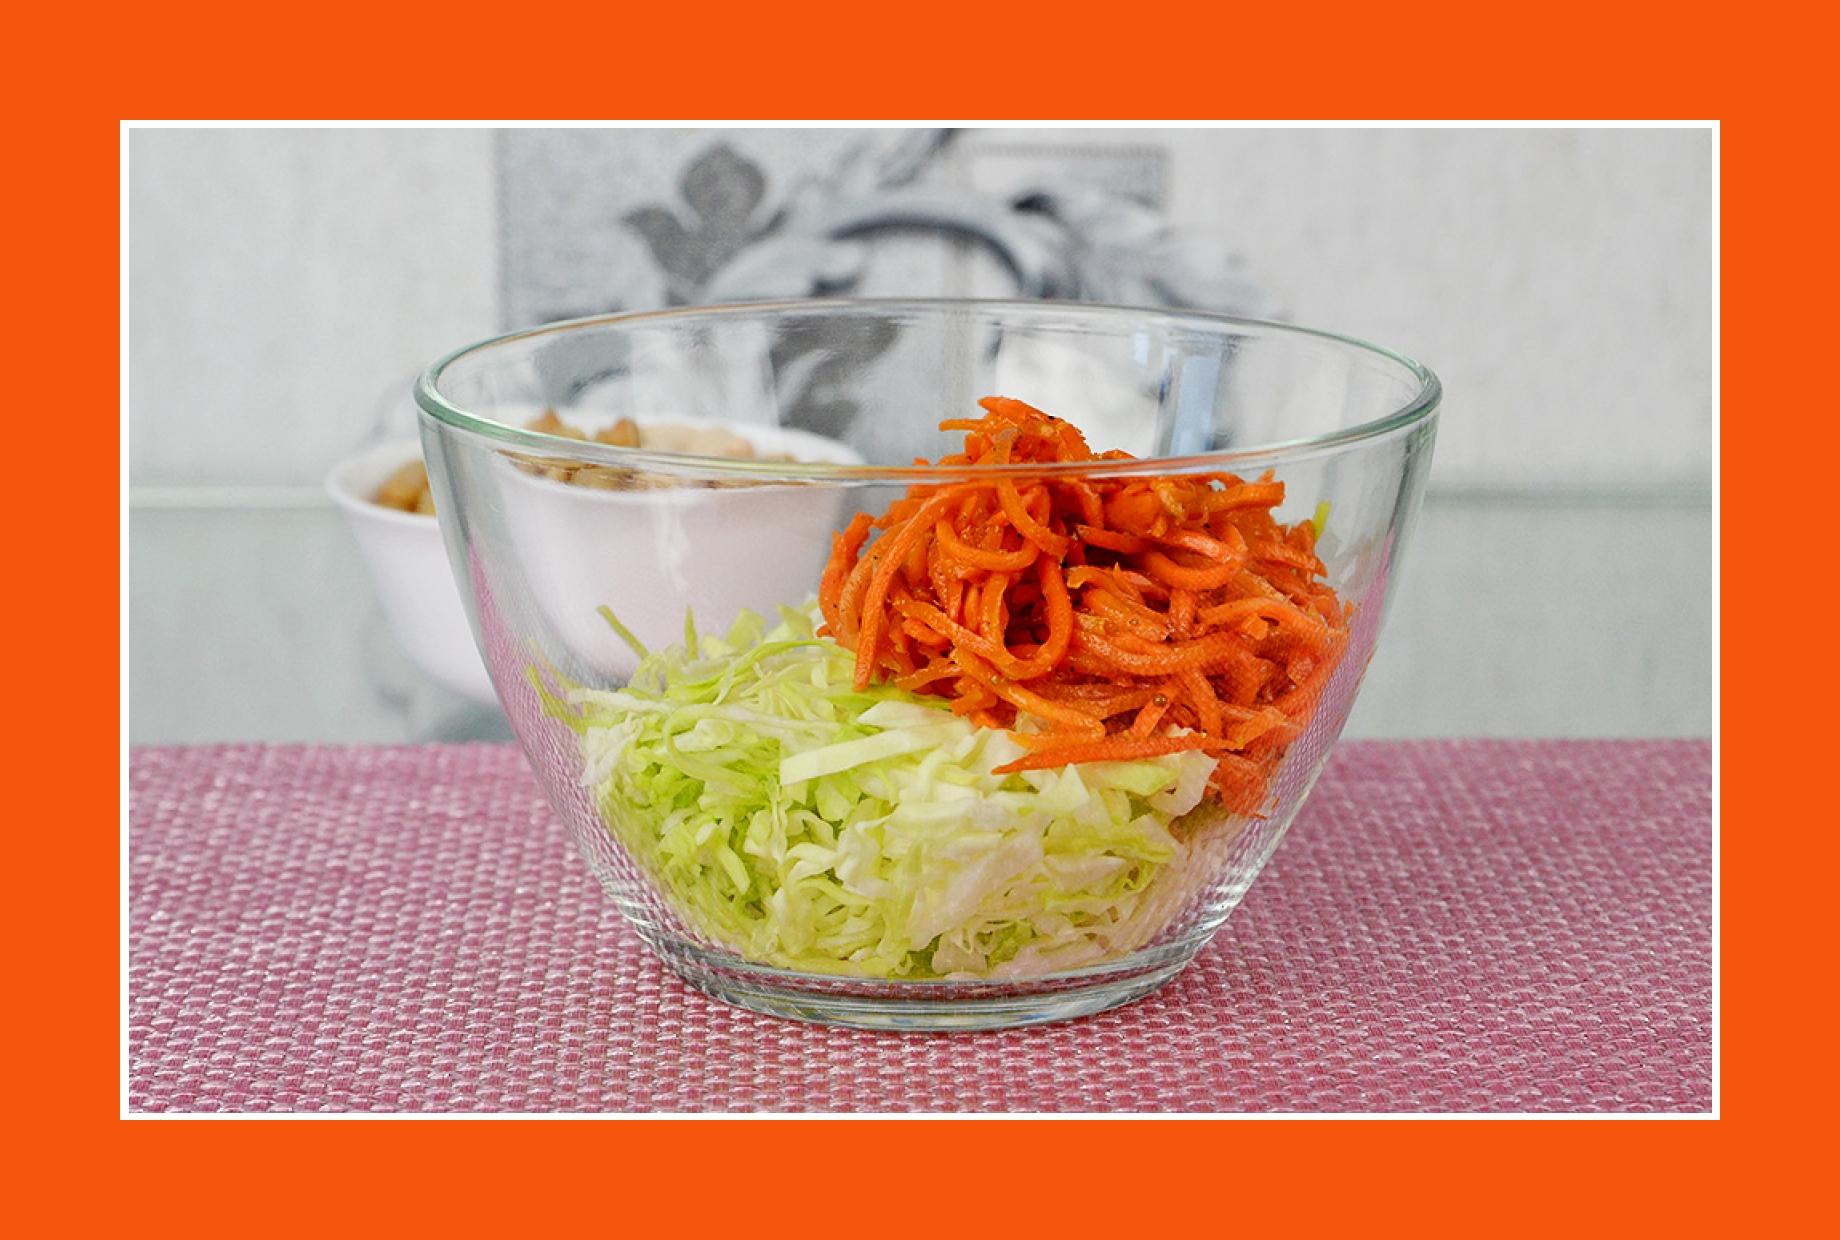 Möhrensalat Weißkrautsalat mit Möhren